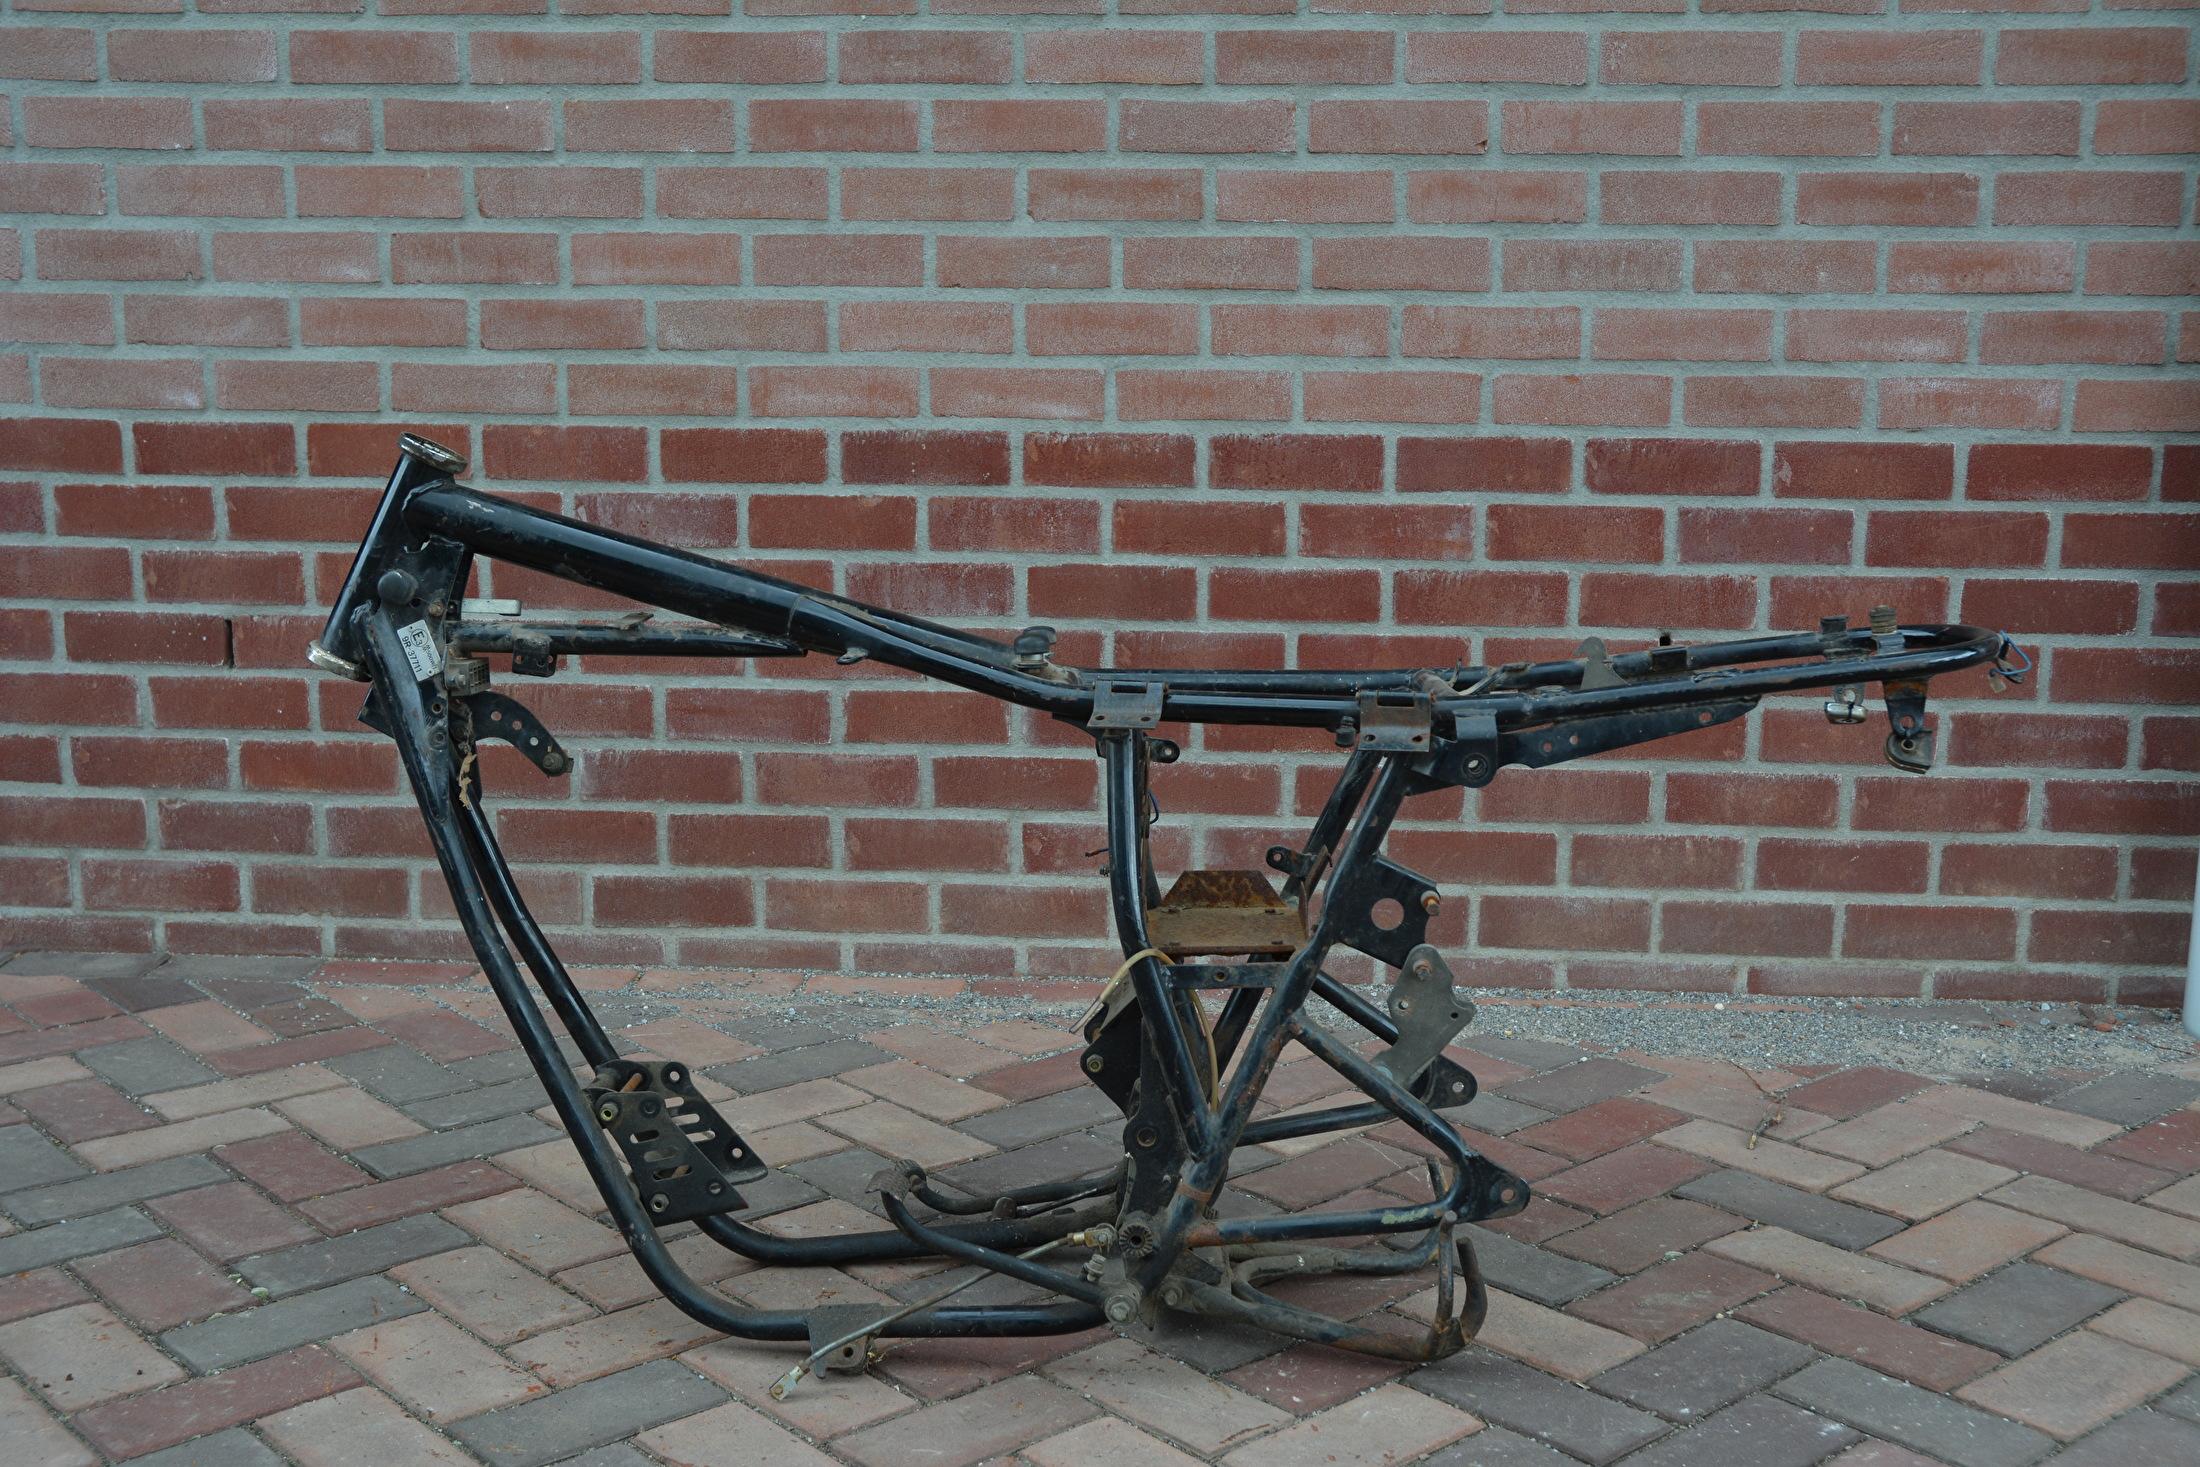 Moto Morini frame